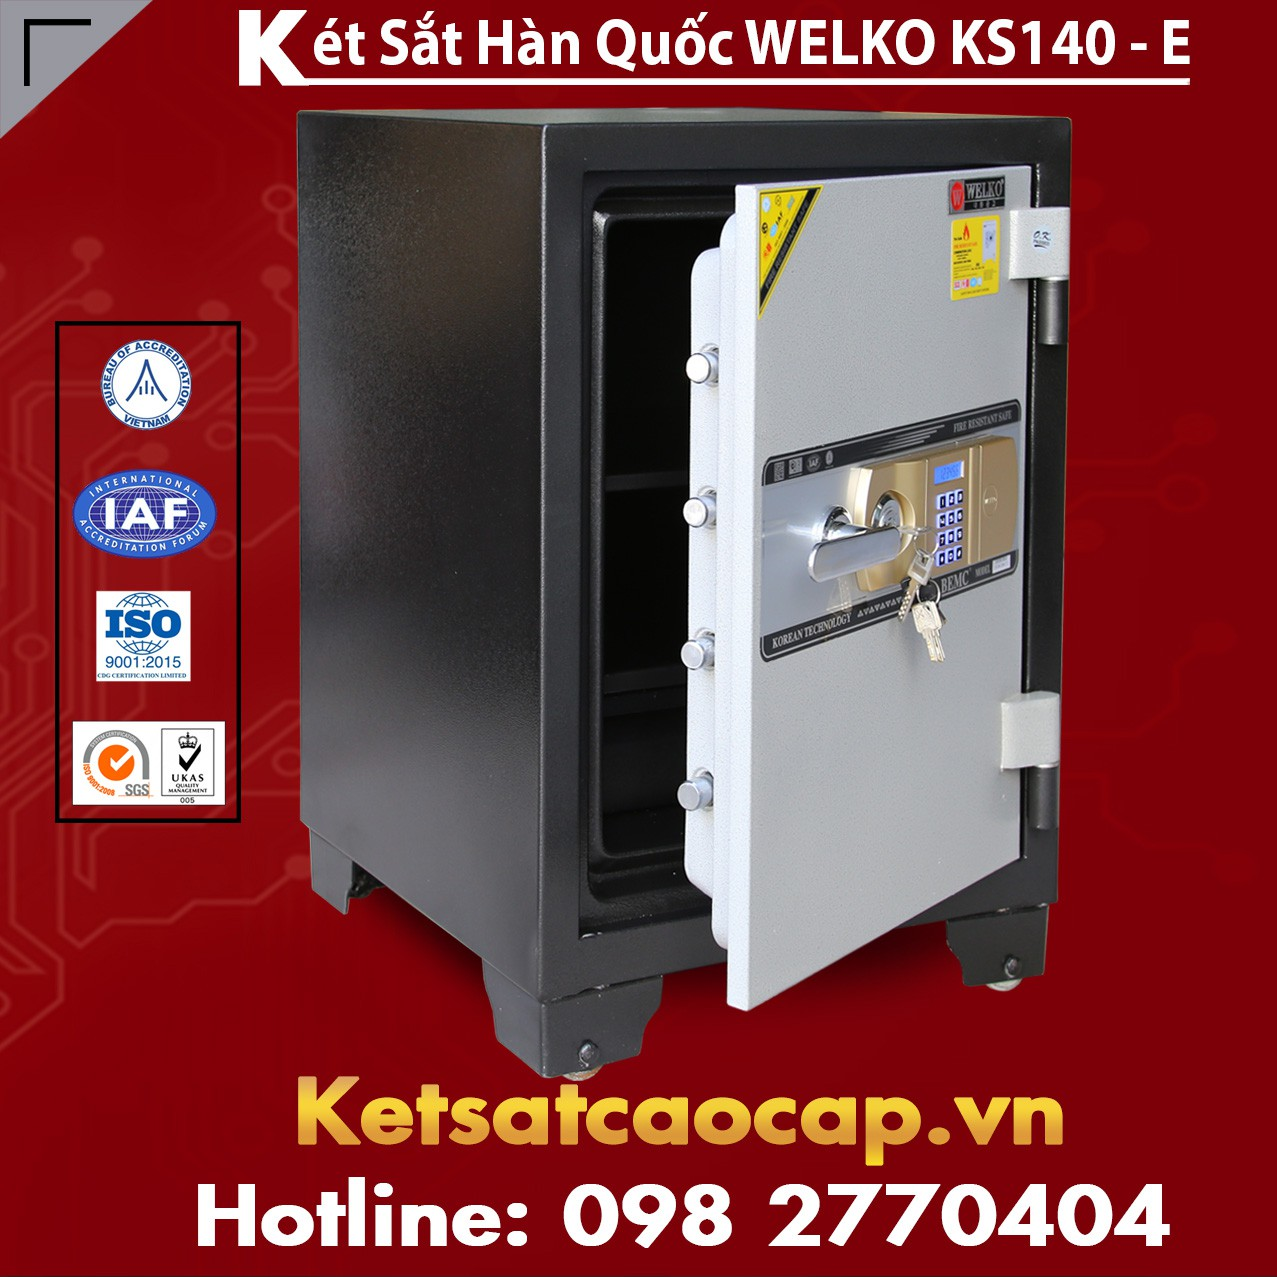 Két Sắt Văn Phòng KS140 - E Gold